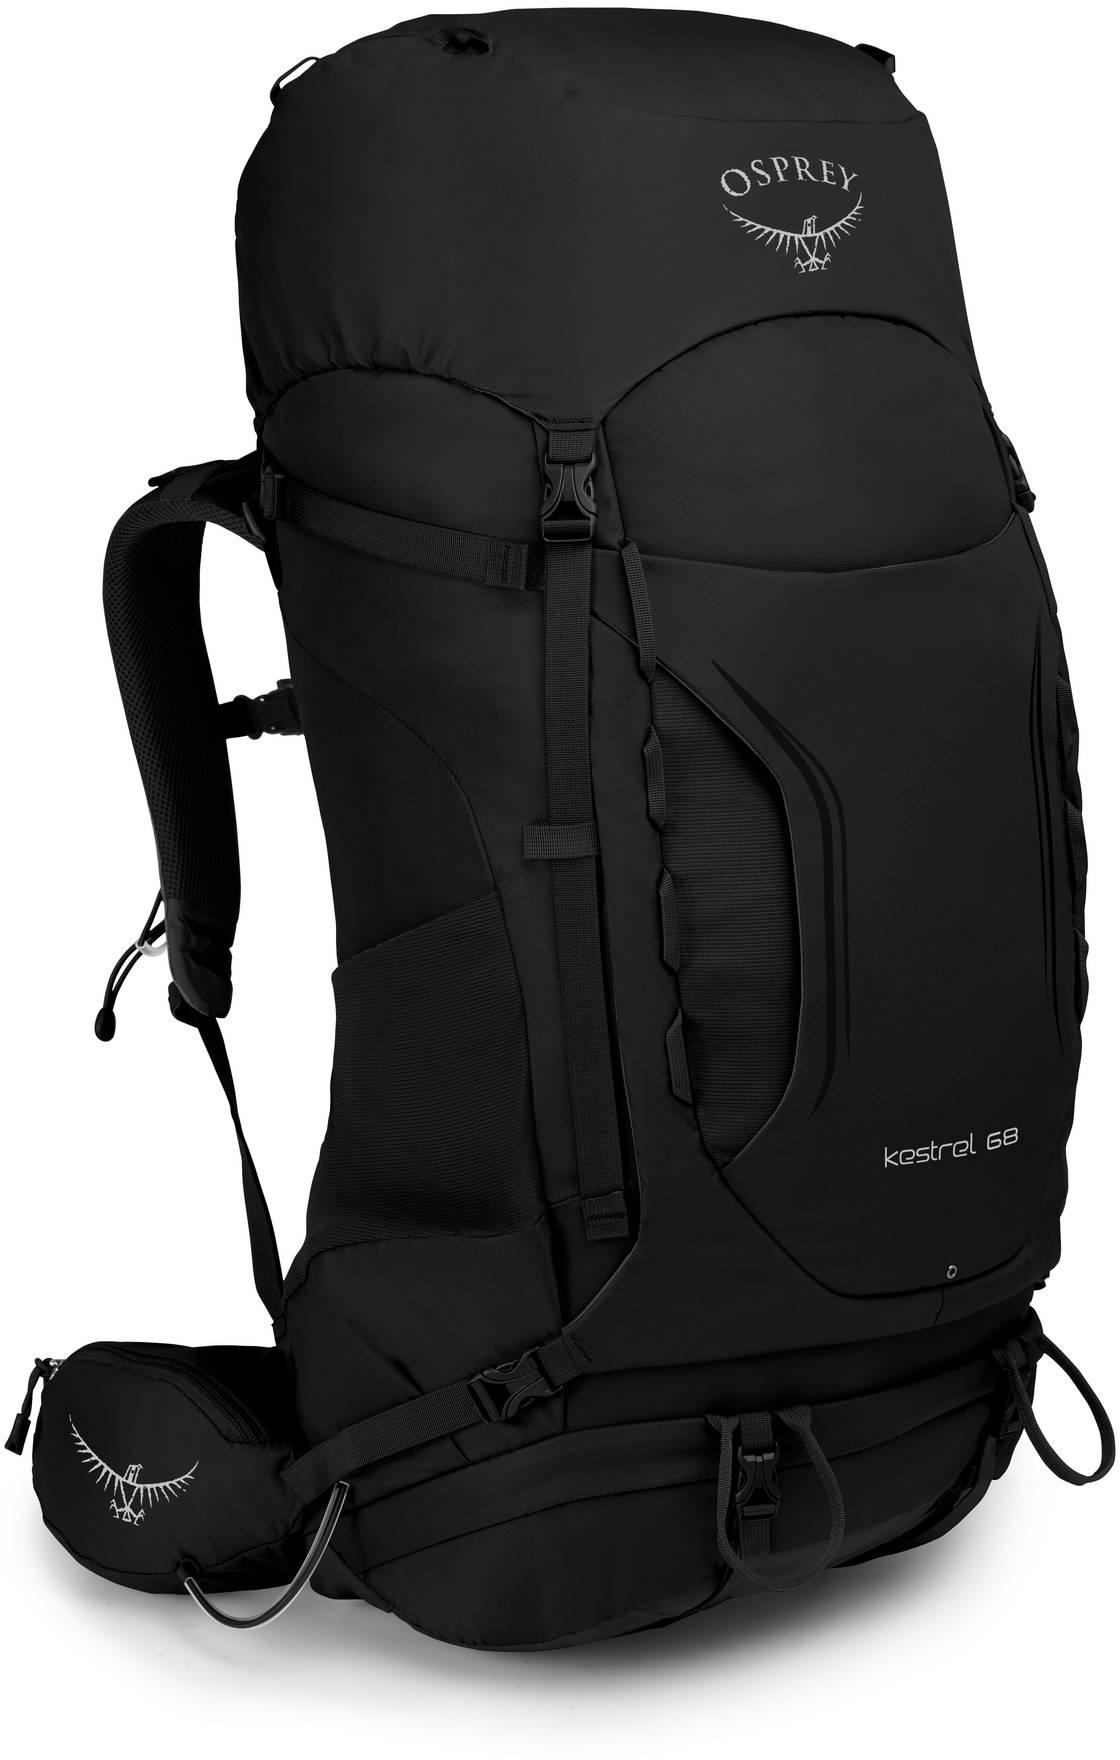 Kestrel Рюкзак туристический Osprey Kestrel 68 Black (2019) Kestrel_68_S19_Side_Black_web.jpg